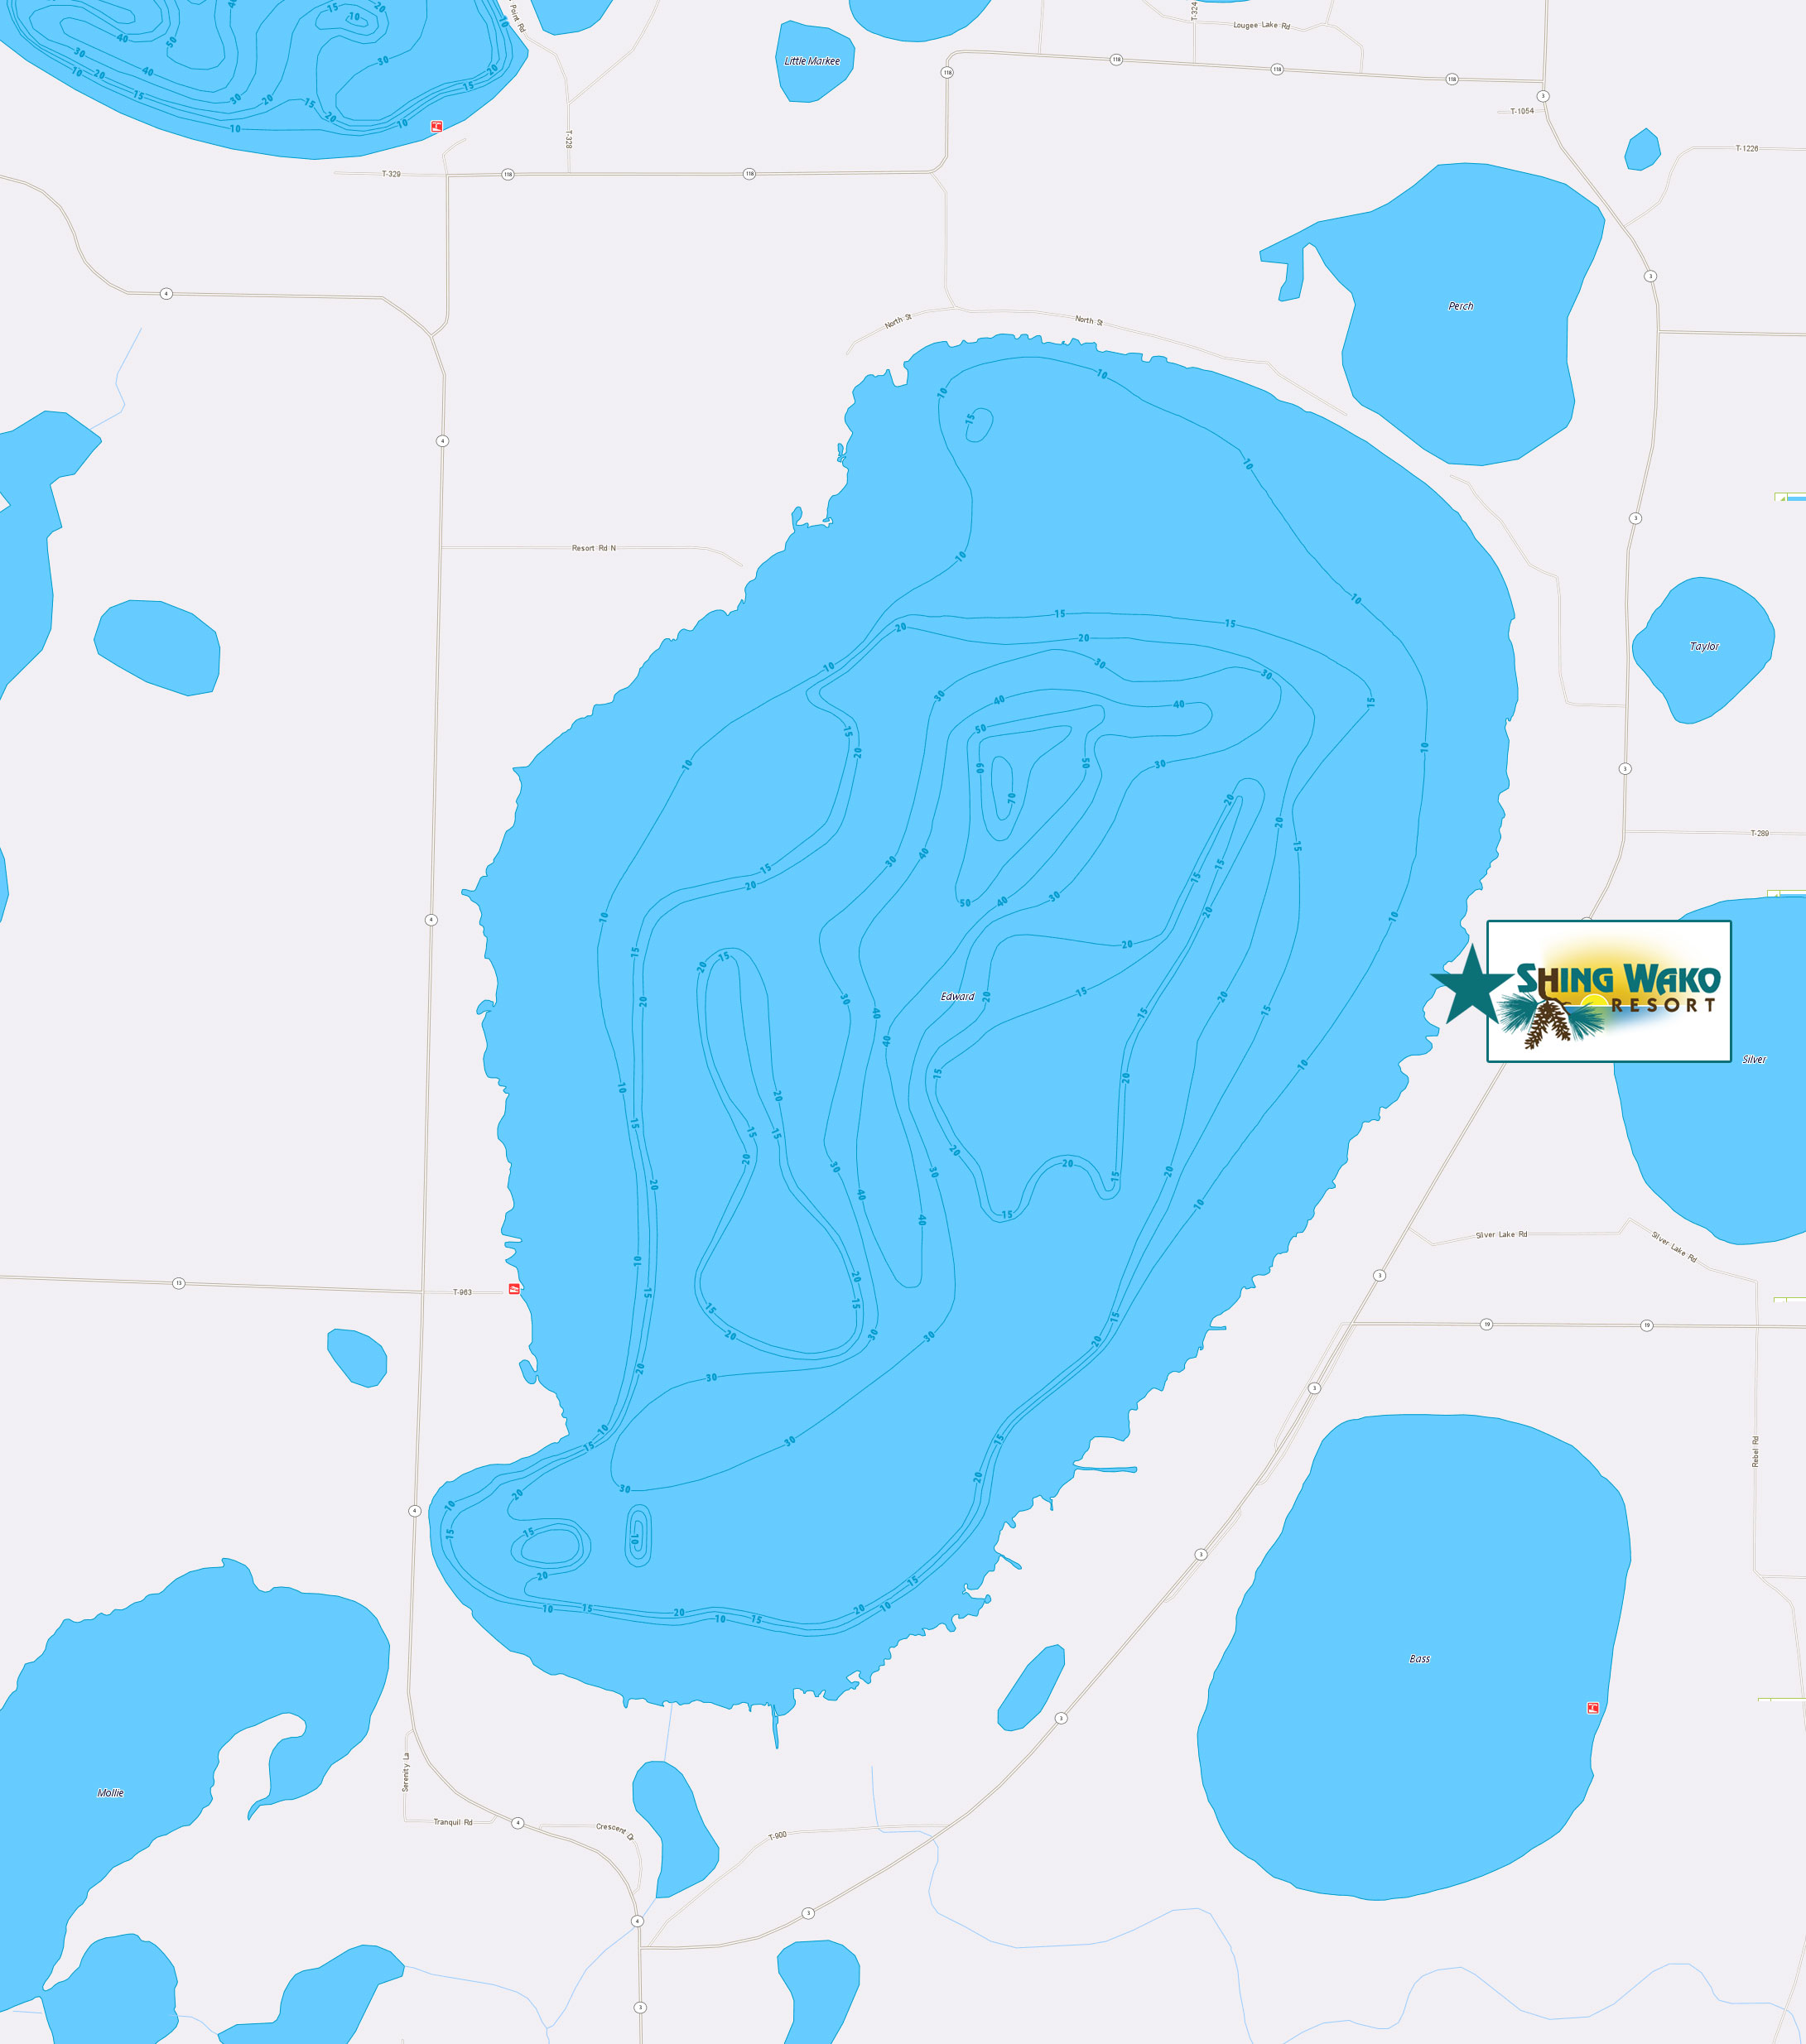 Lake Edward Map - Fish & Explore Lake Edward - Fishing inerd, MN on